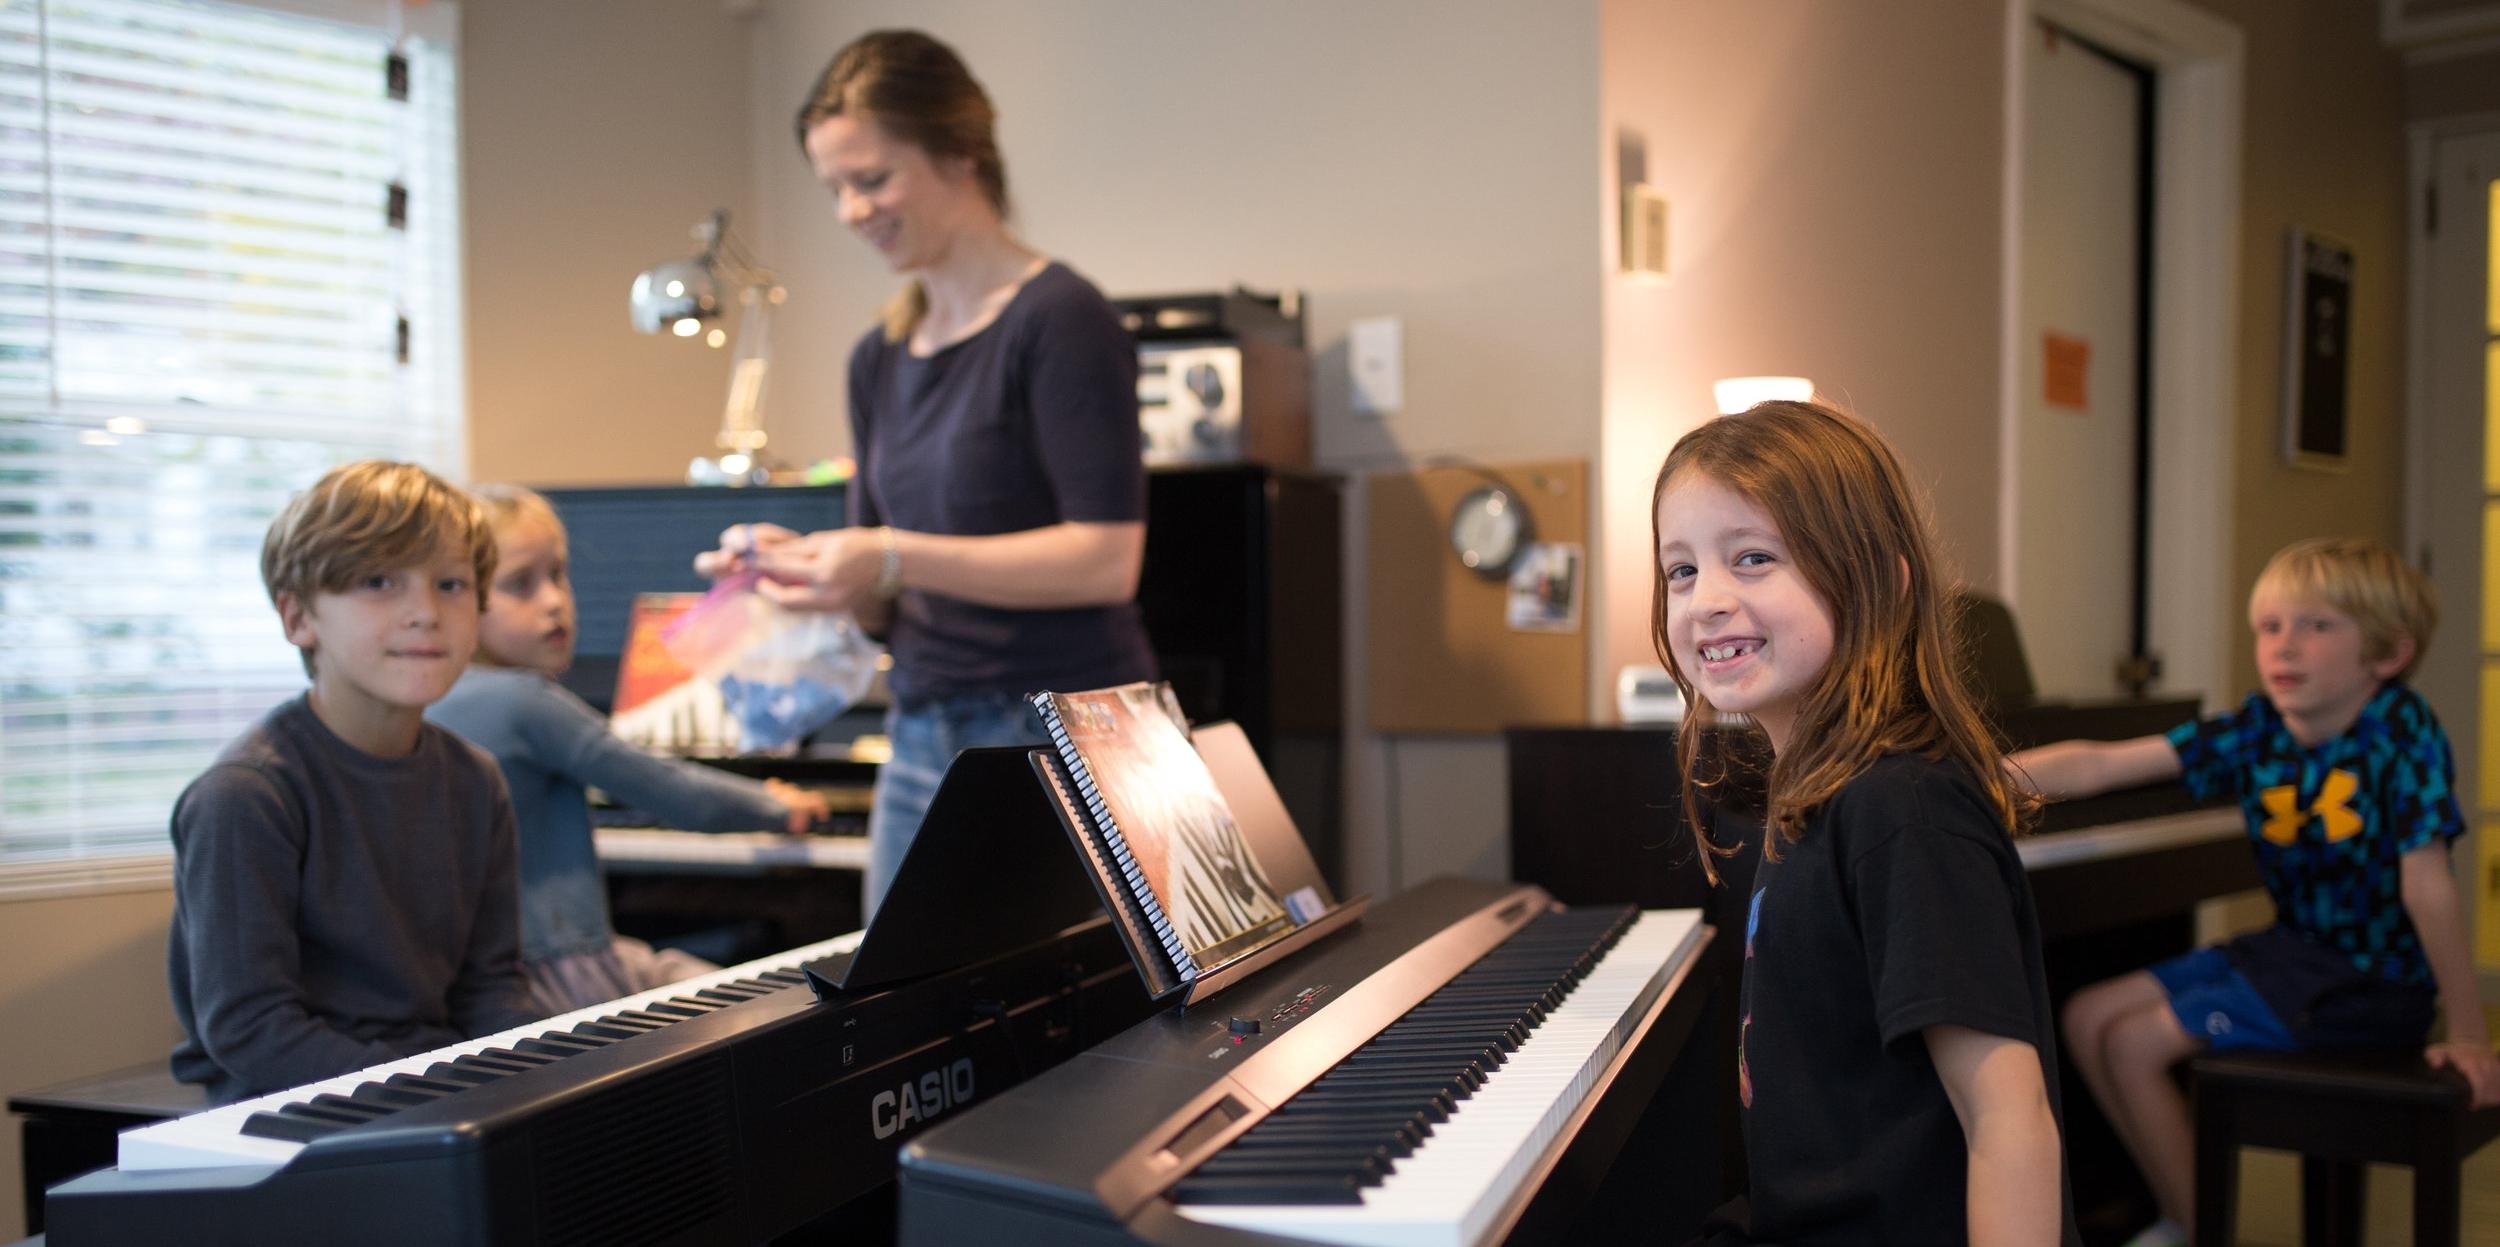 group-piano-students.jpg